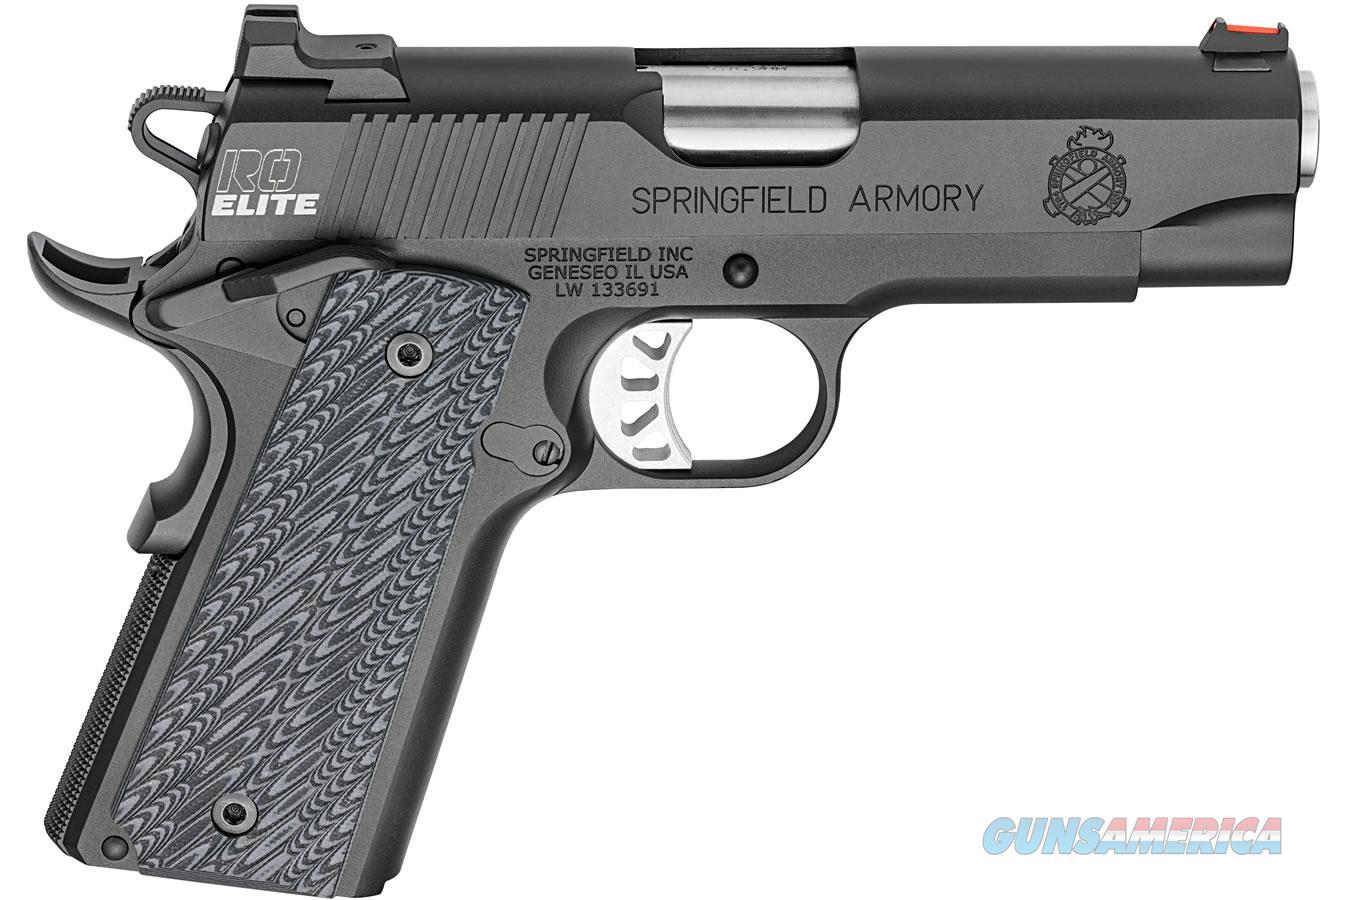 "Springfield 1911 Range Officer Elite Champion 9mm 4"" PI9137E   Guns > Pistols > Springfield Armory Pistols > 1911 Type"